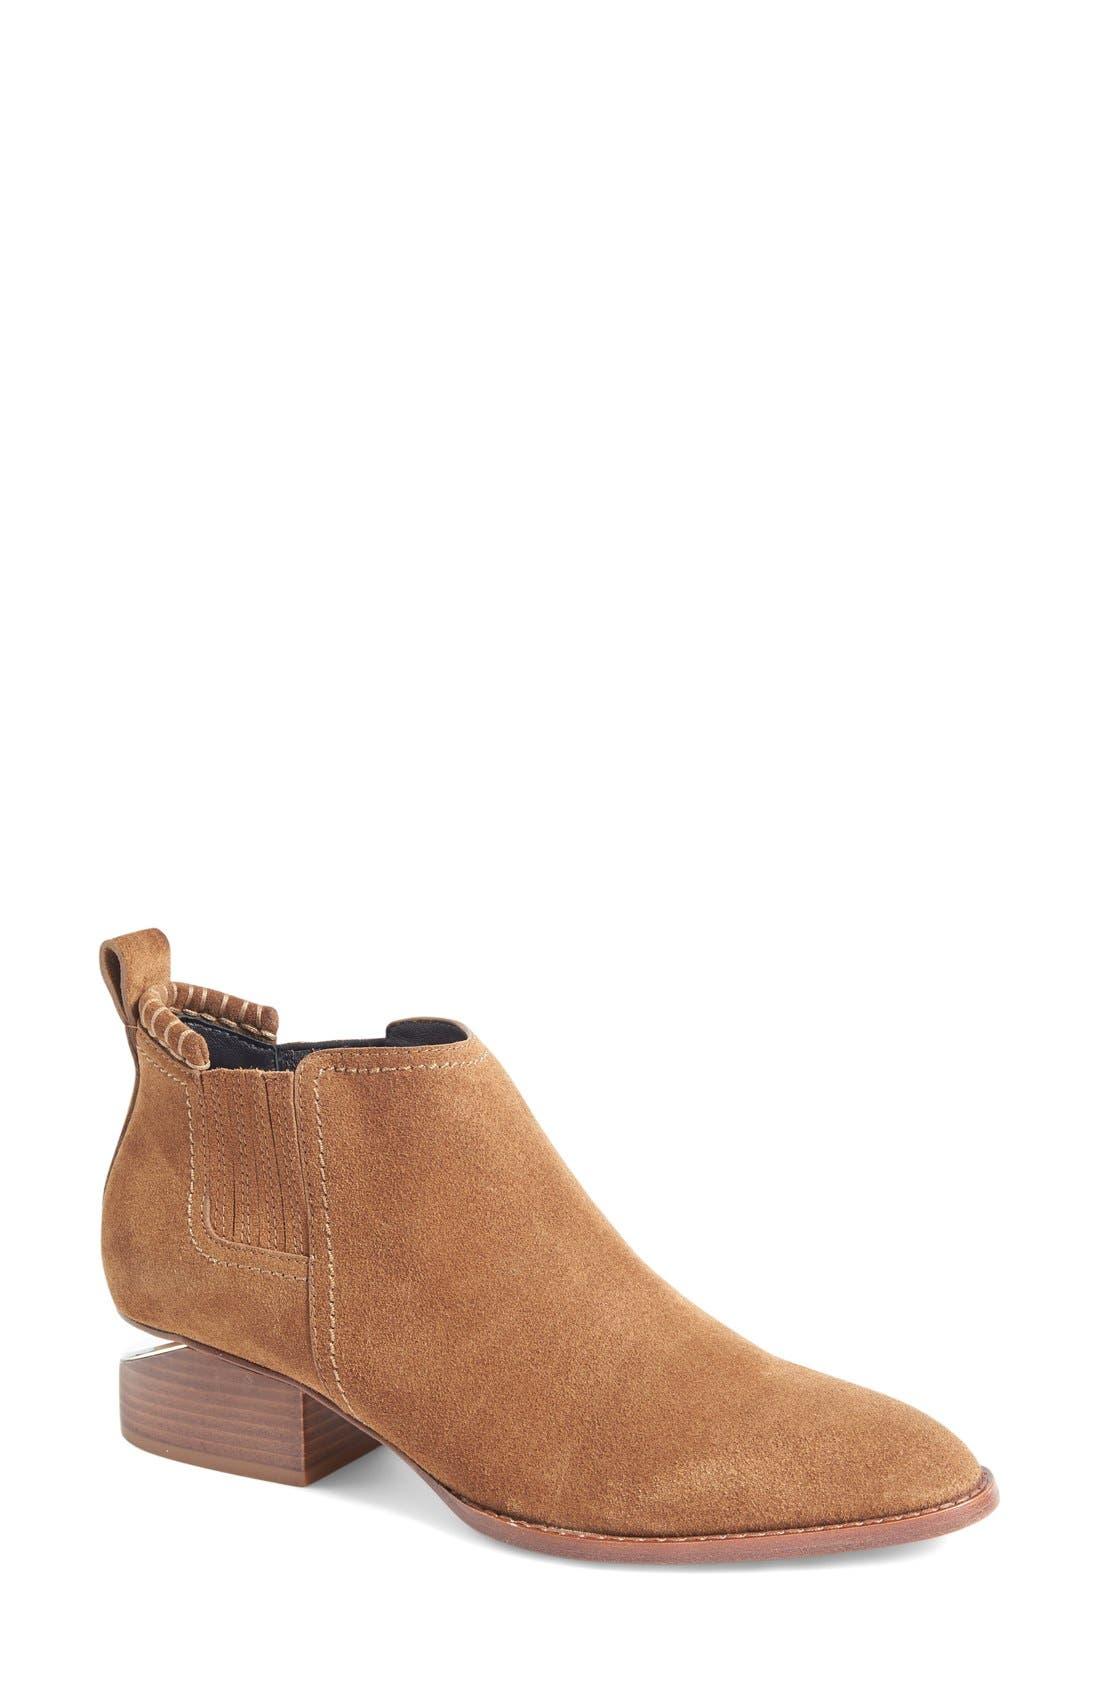 Kori Chelsea Boot,                         Main,                         color, DARK TRUFFLE